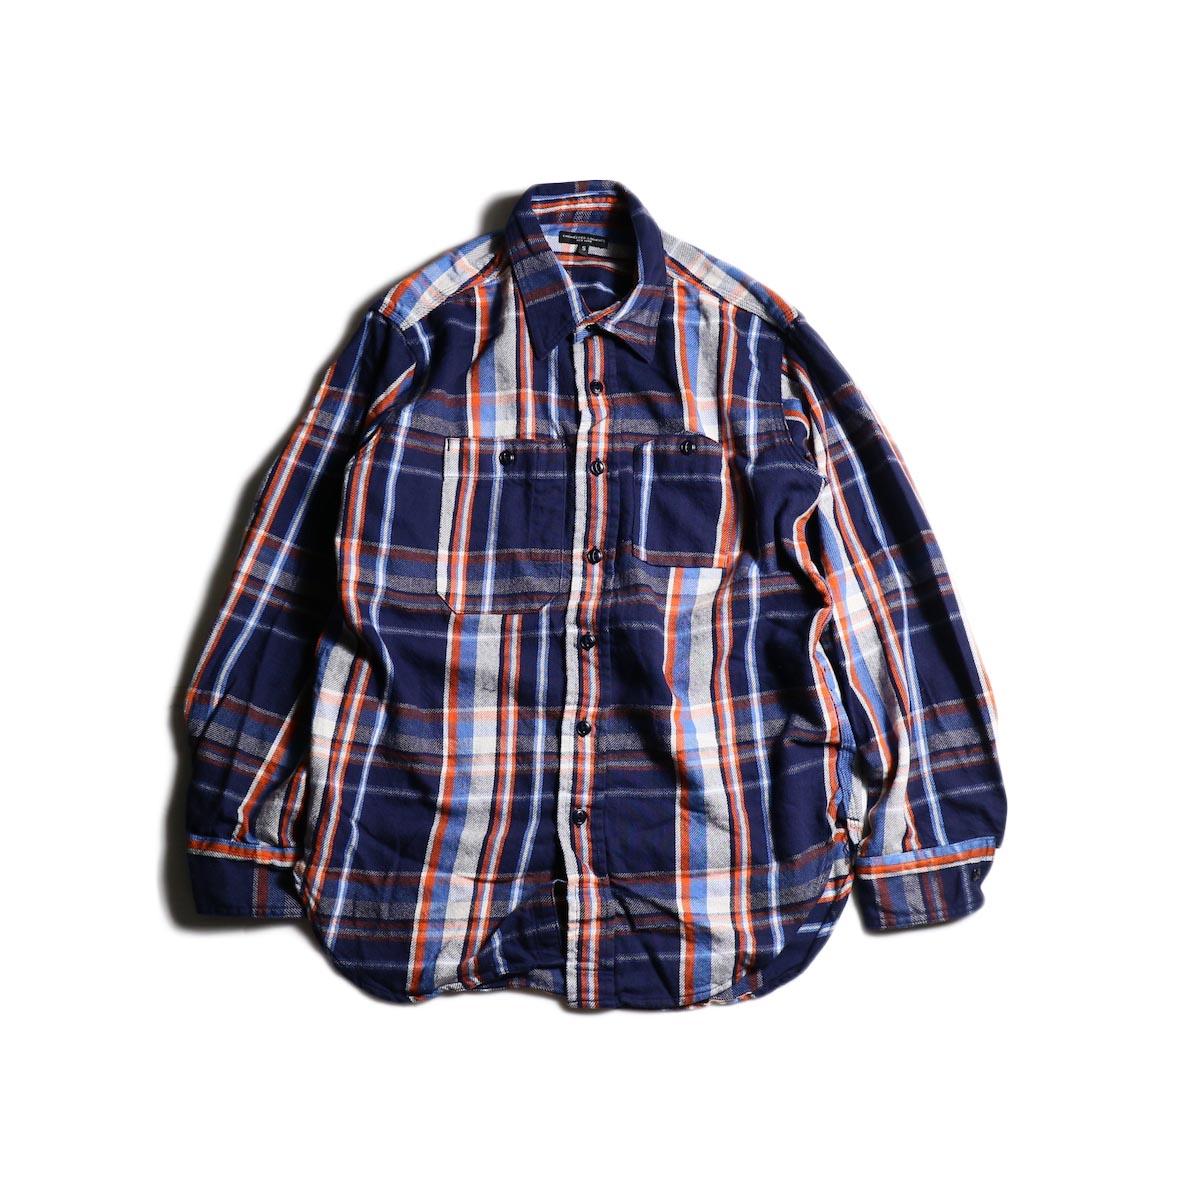 Engineered Garments / Work Shirt -Twill Plaid (Navy/Org/Lt.Blu)